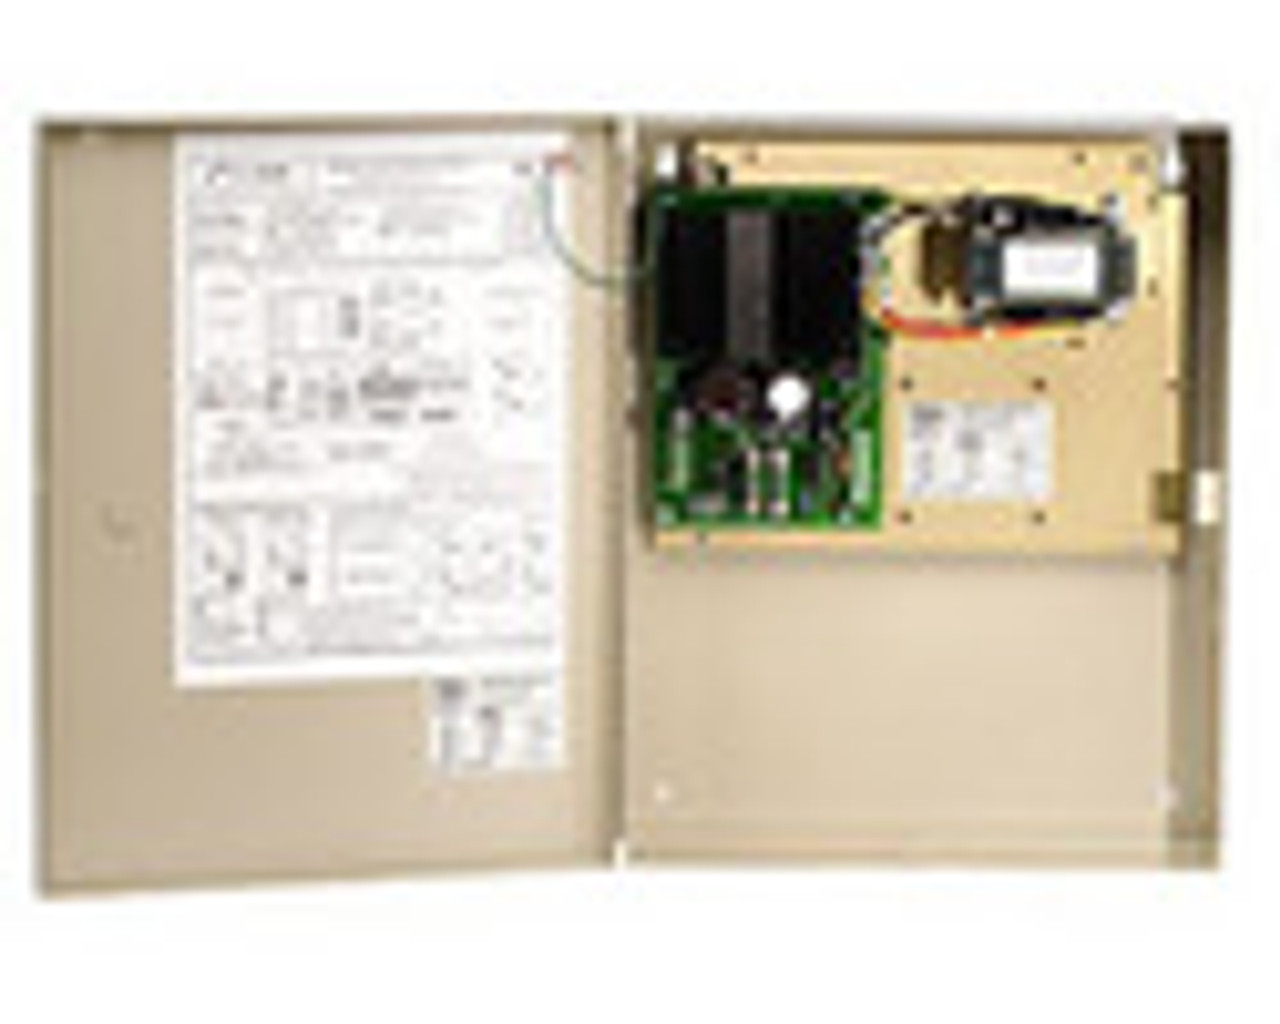 5500-FAC-KLC DynaLock Multi Zone Medium Duty Power Supply with Fire Alarm Module and Key Locked Cover